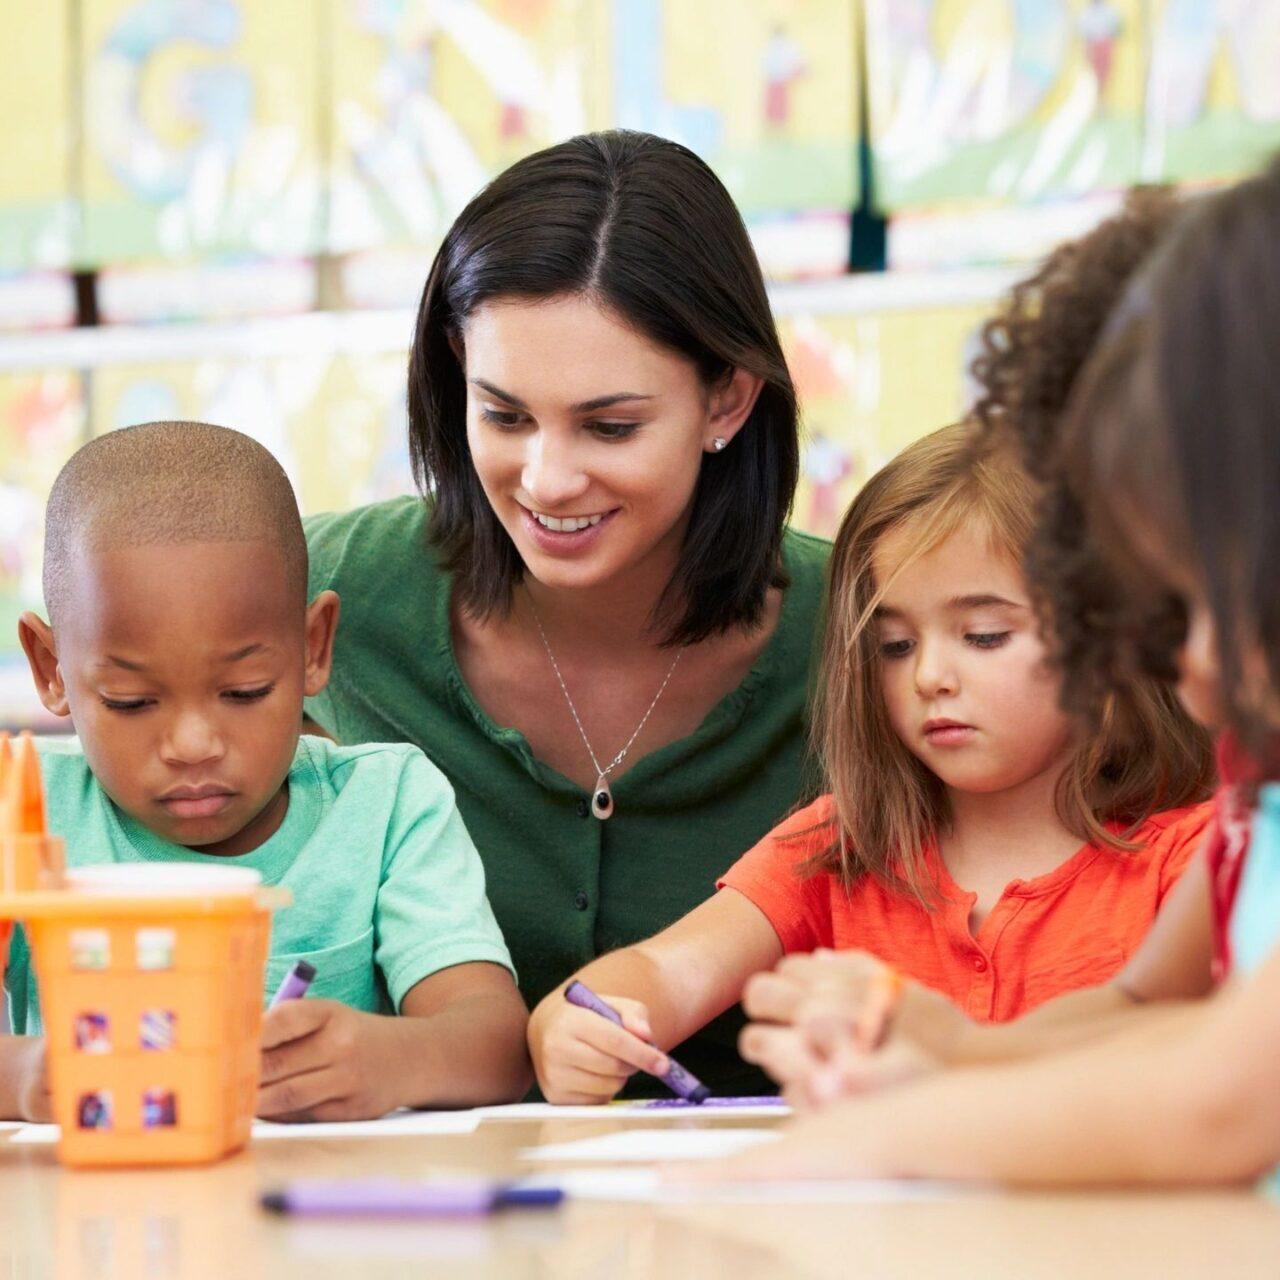 Little Wonders Early Learning Center